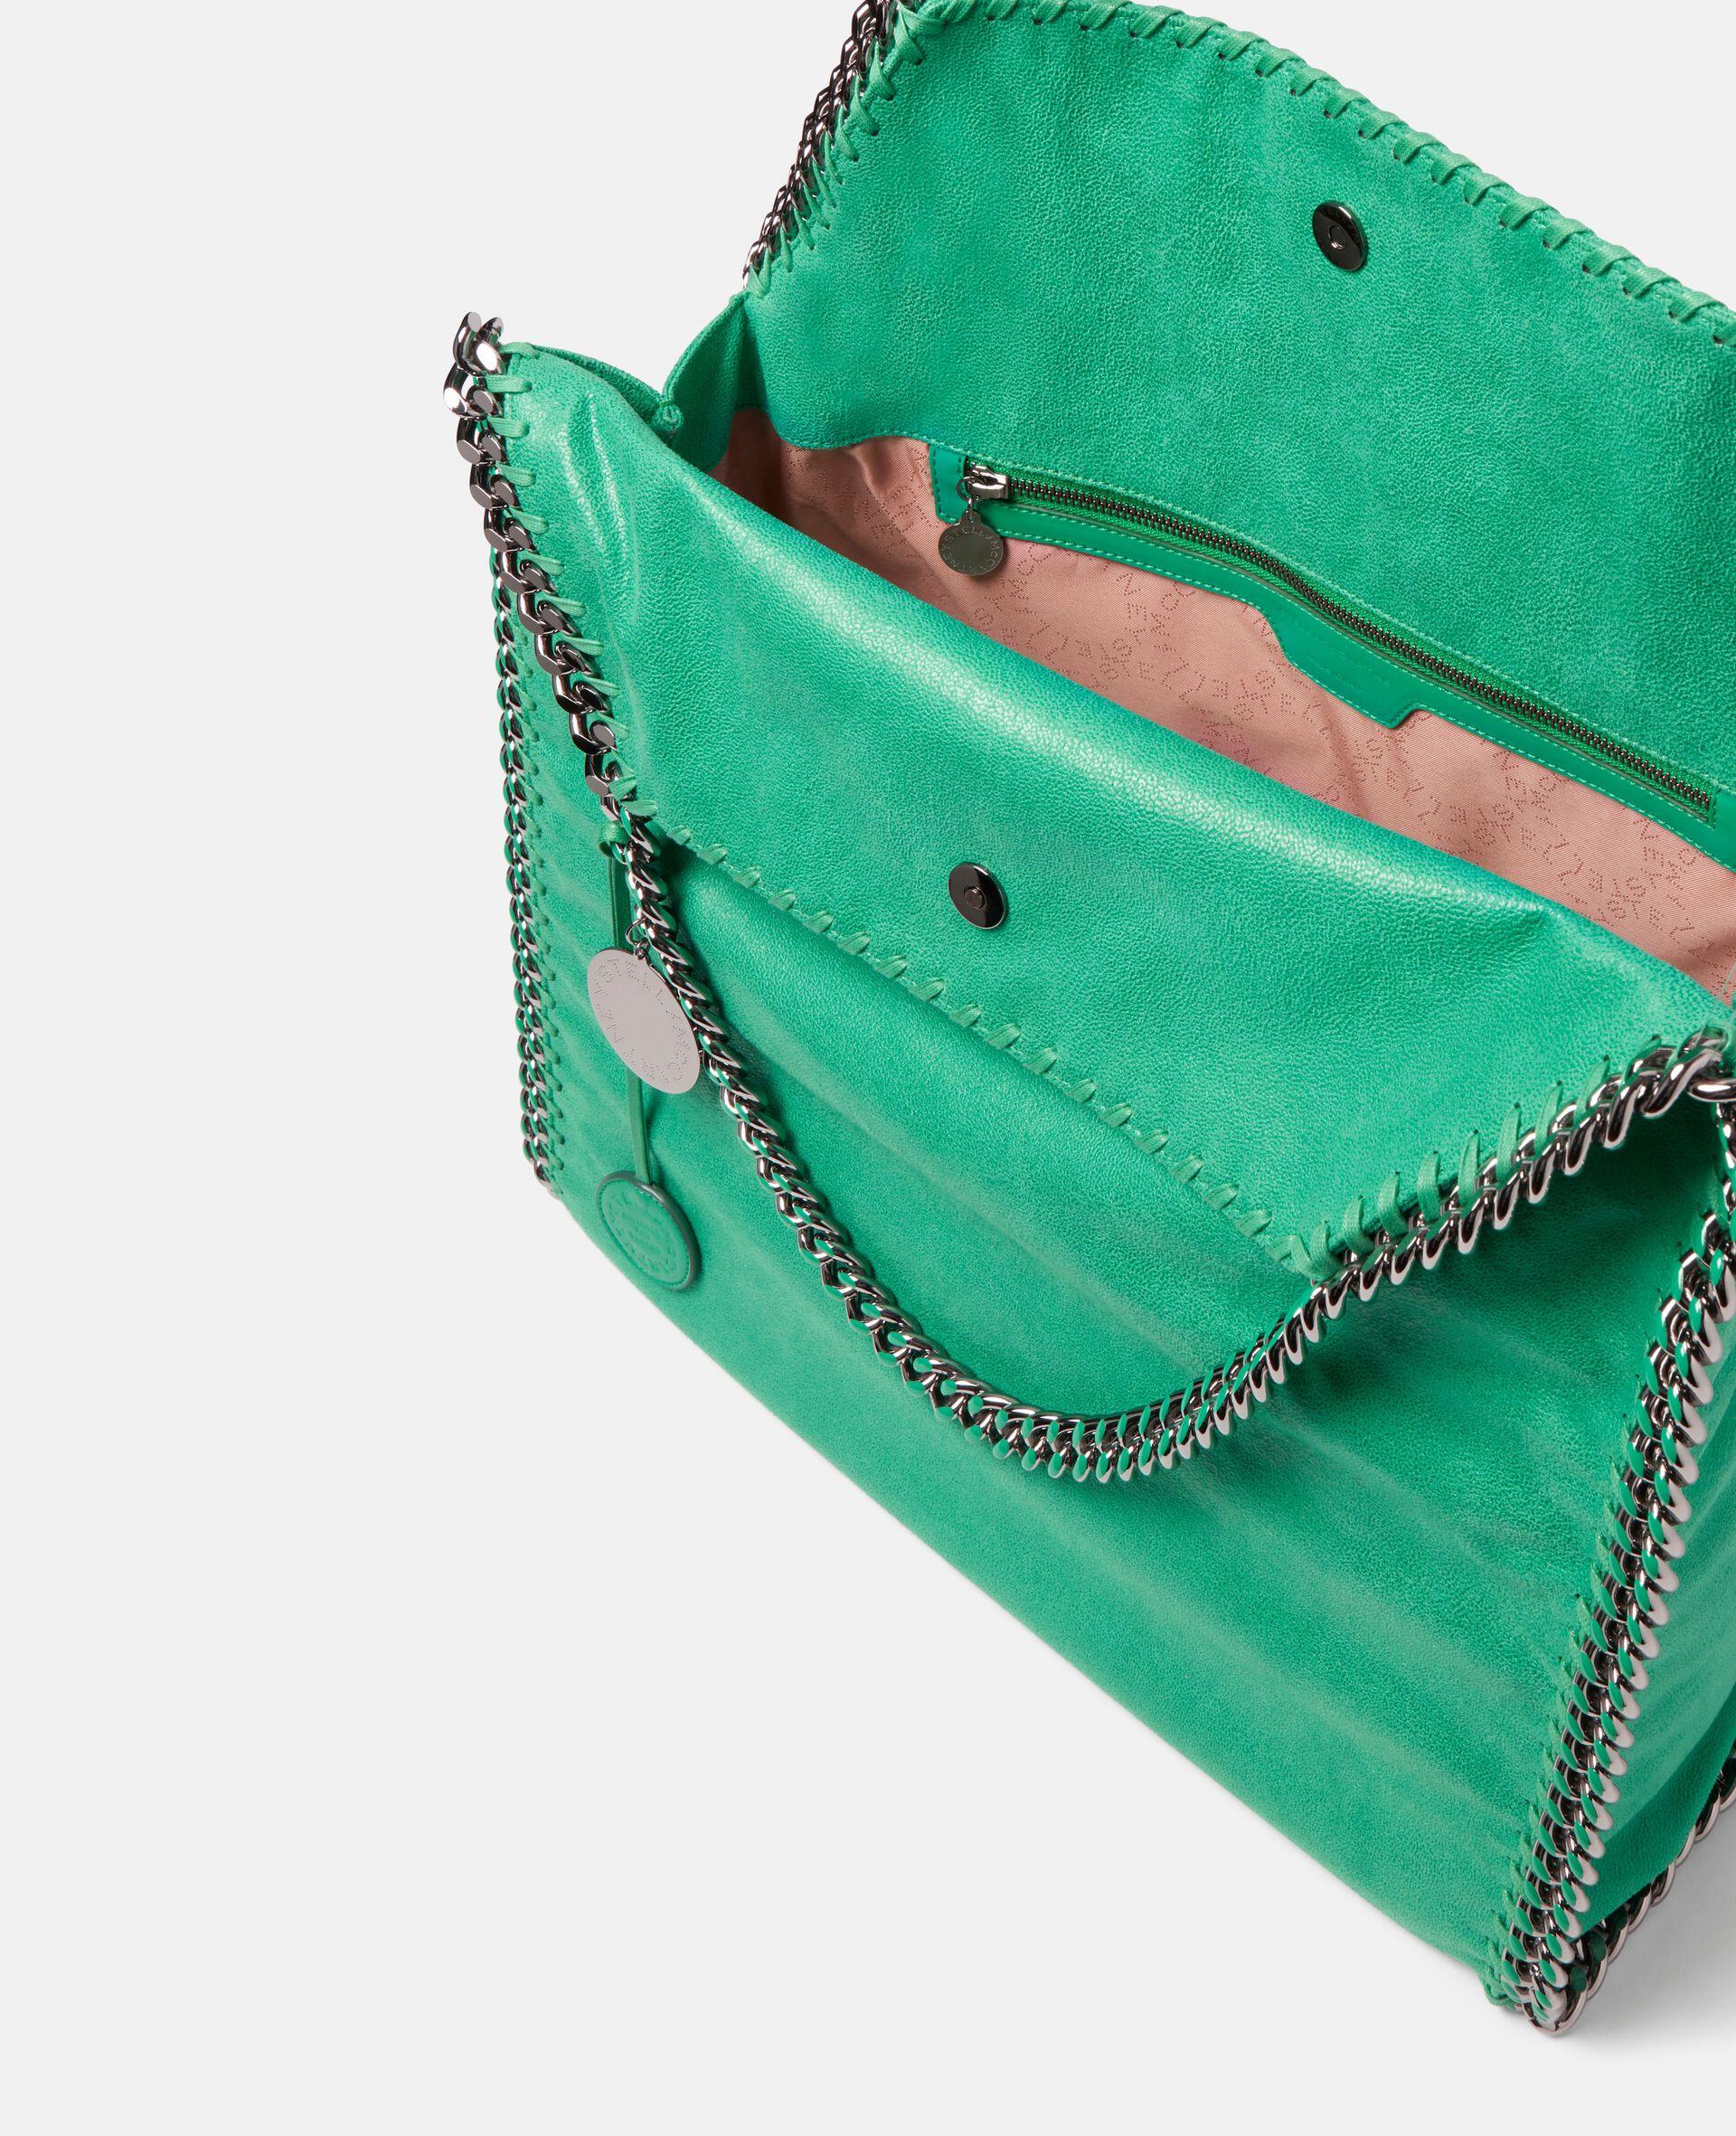 Maxi Falabella Tote-Green-large image number 3